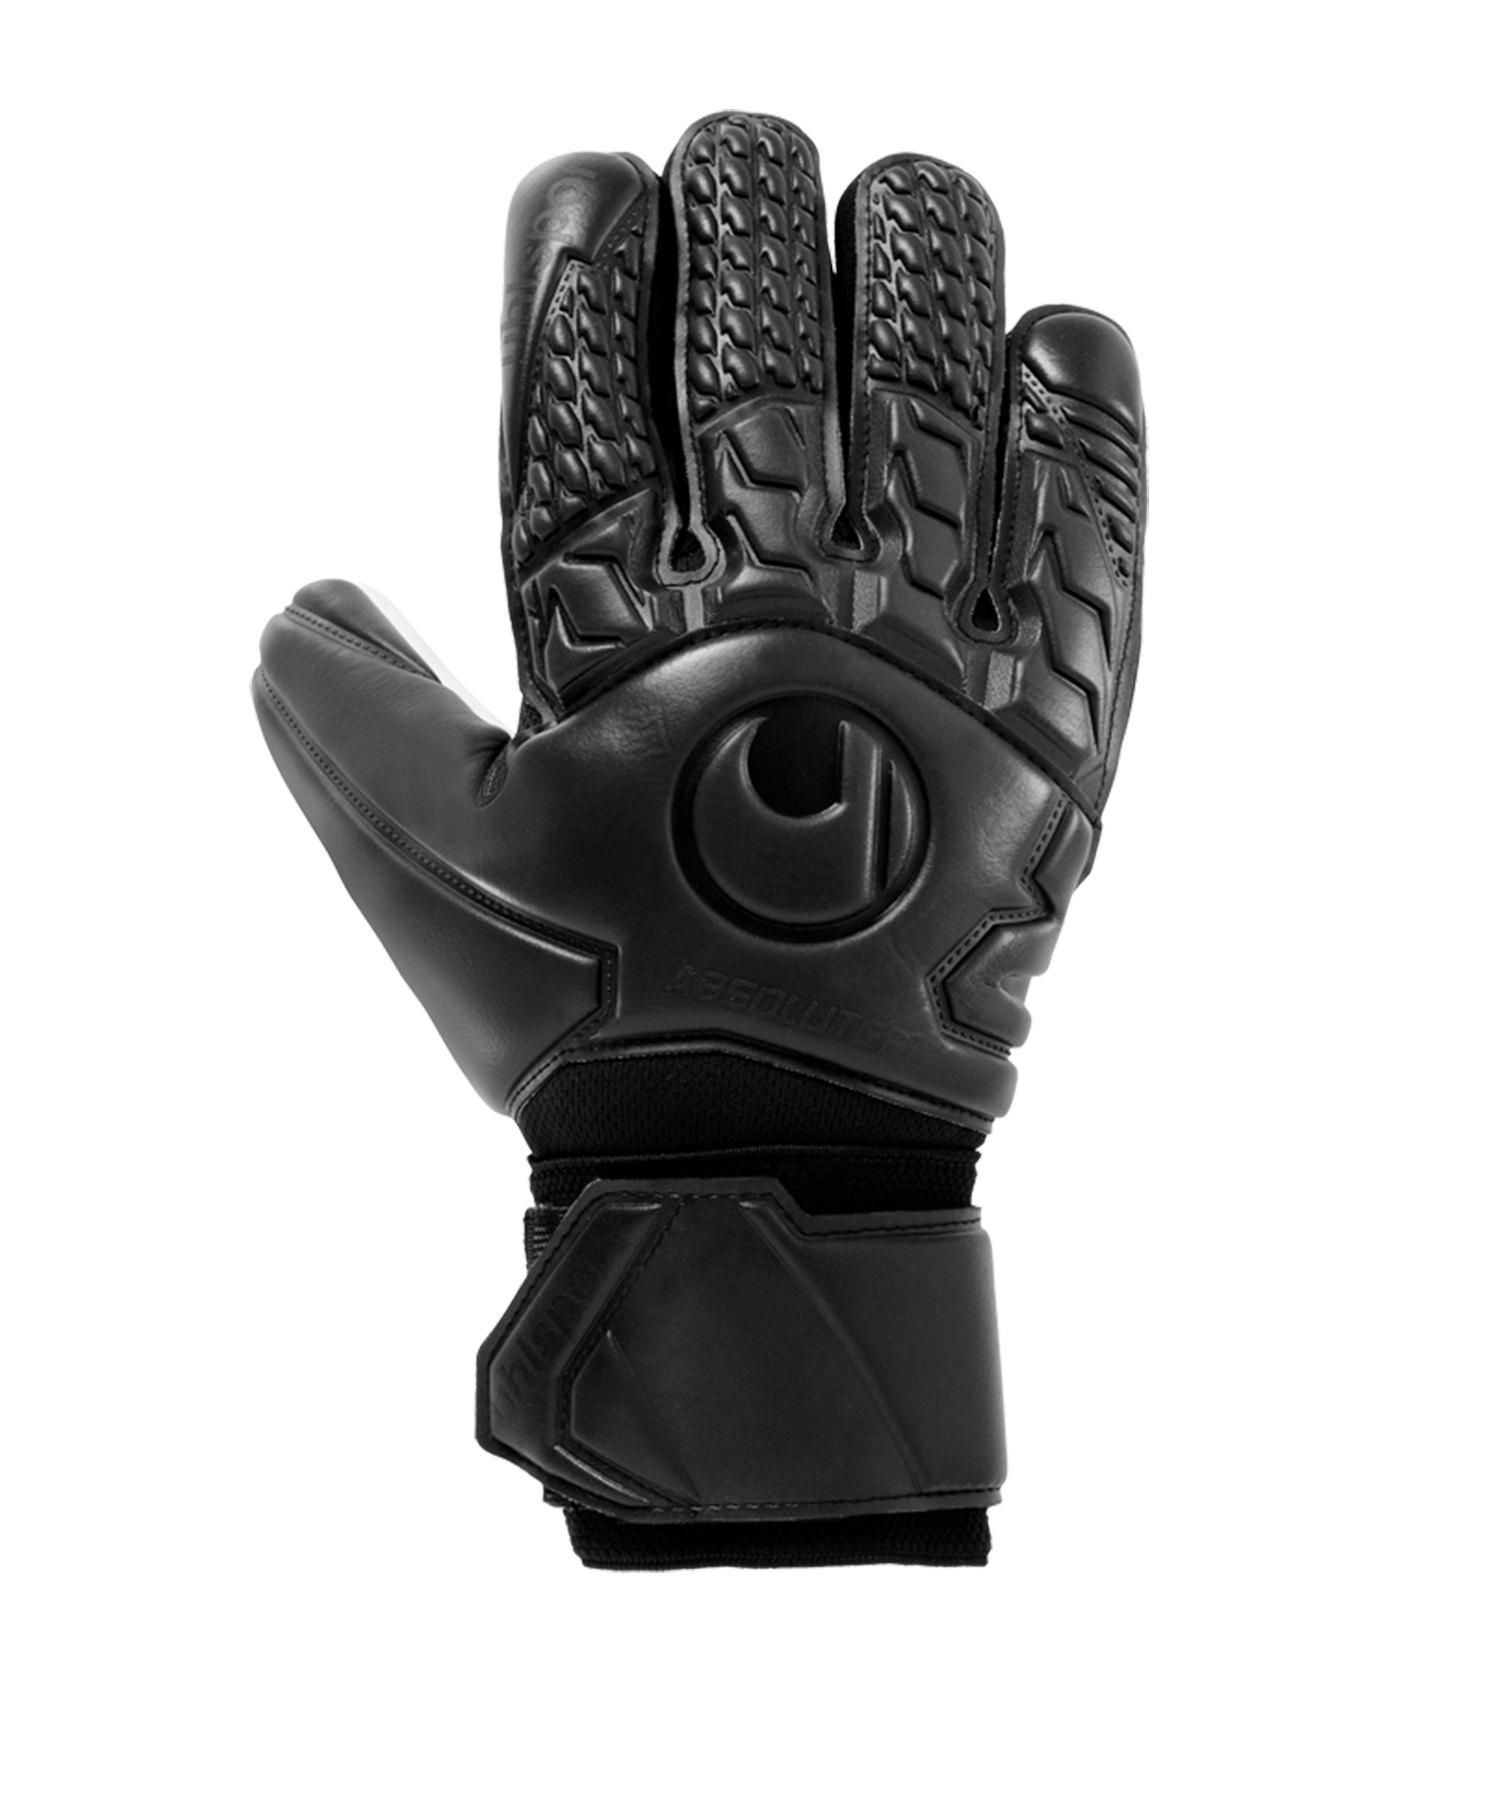 Uhlsport Comfort AG HN TW-Handschuh Schwarz F01 - schwarz